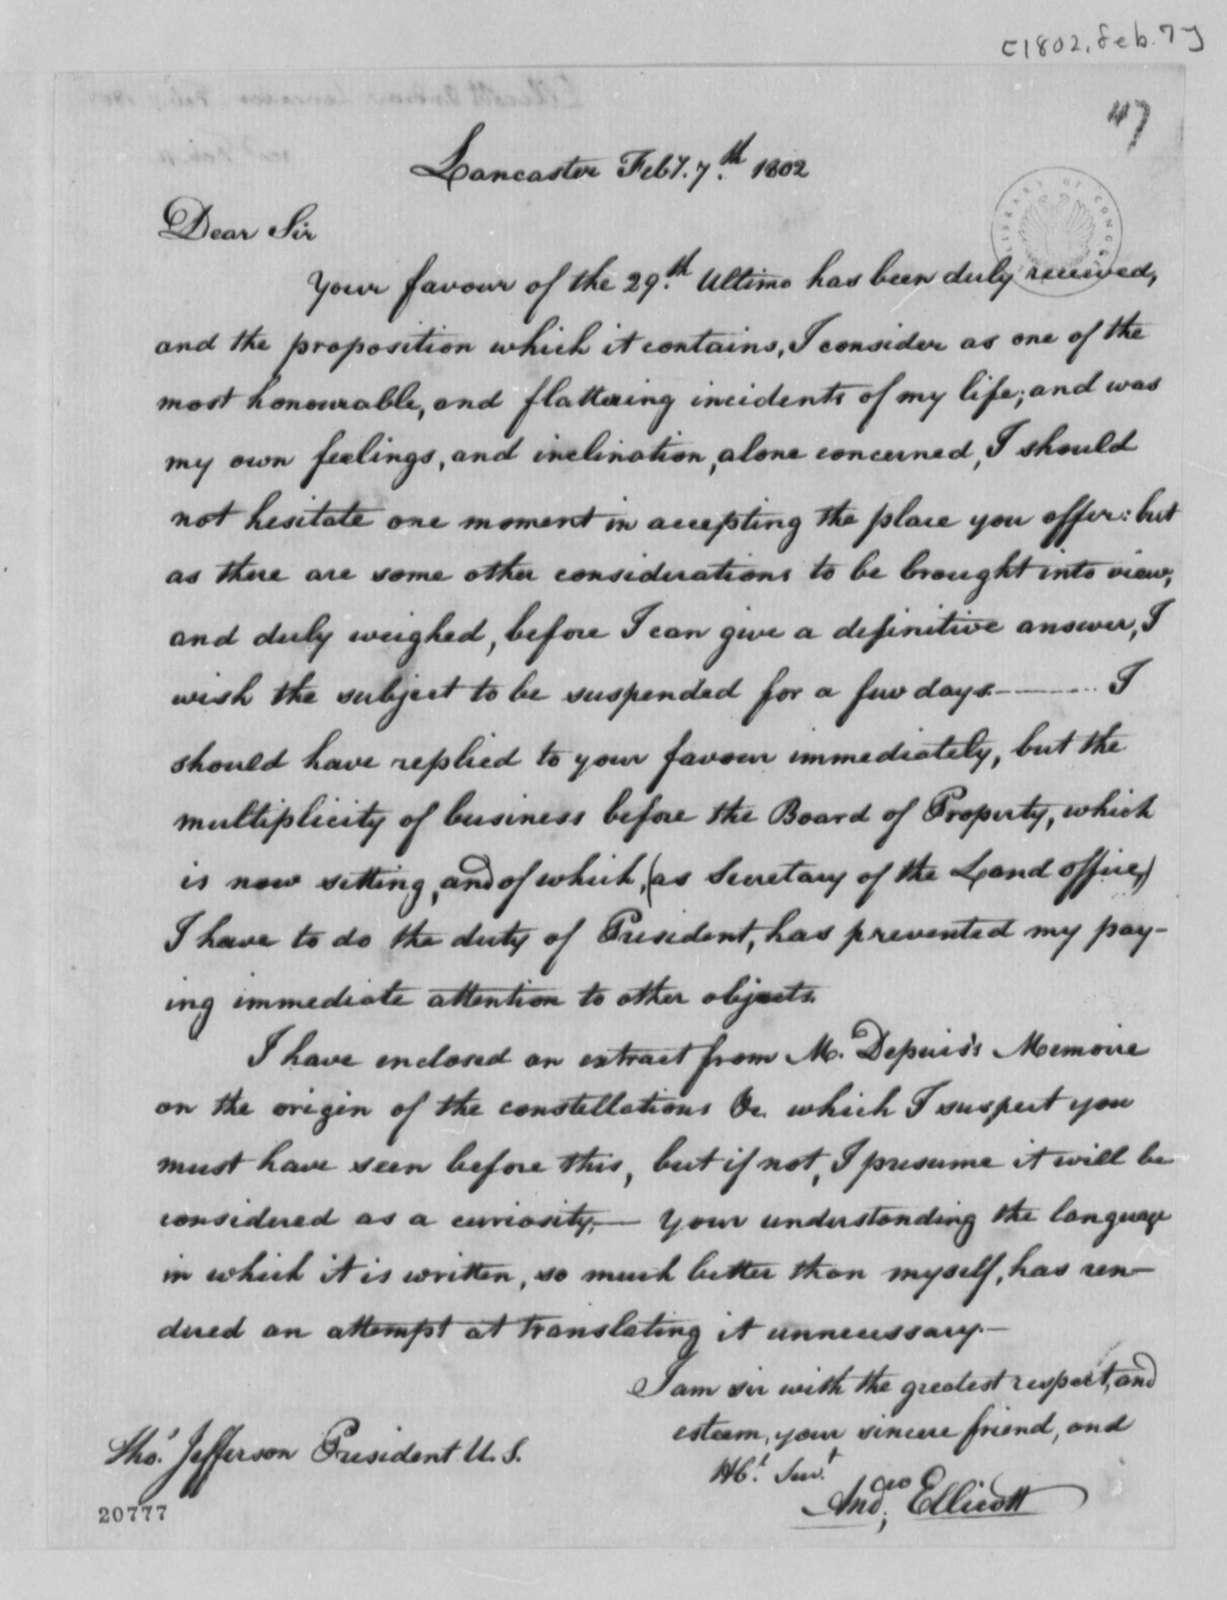 Andrew Ellicott to Thomas Jefferson, February 7, 1802